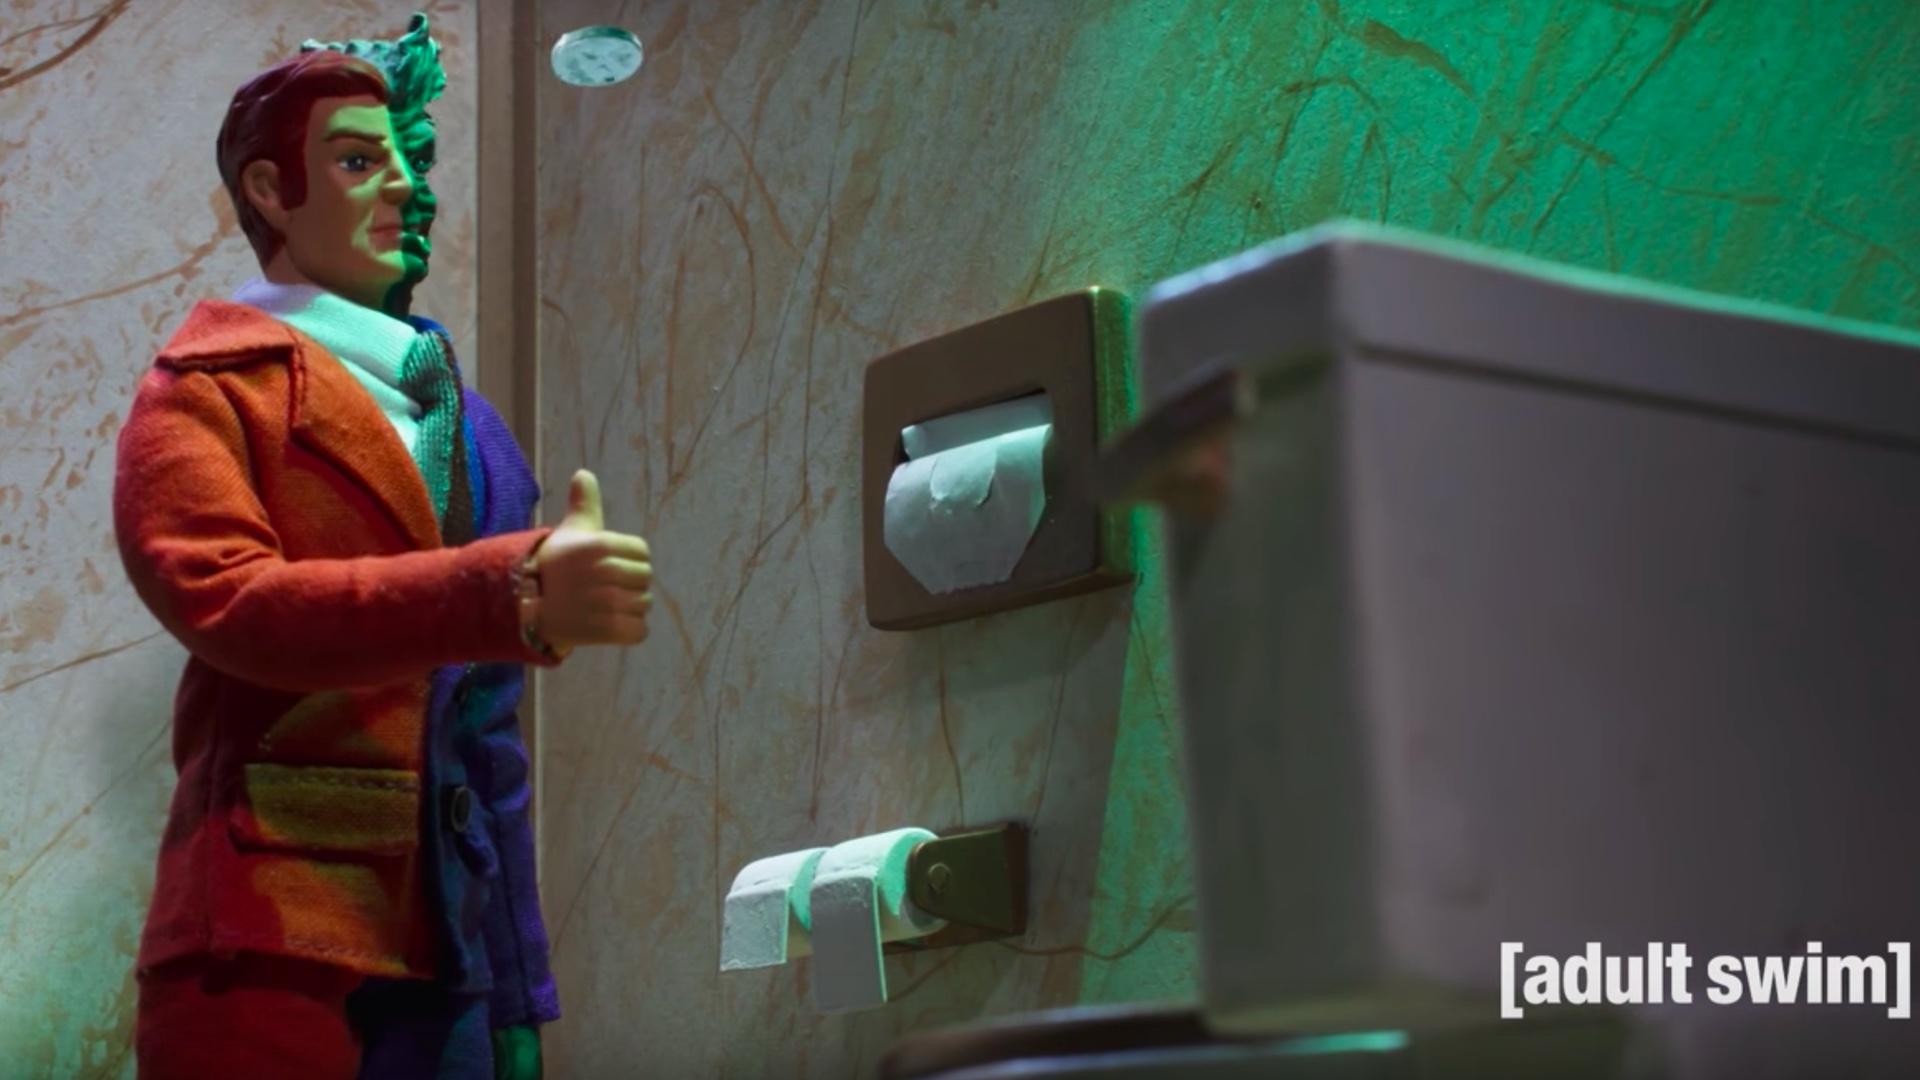 TwoFace Takes a Bathroom Break in Funny ROBOT CHICKEN